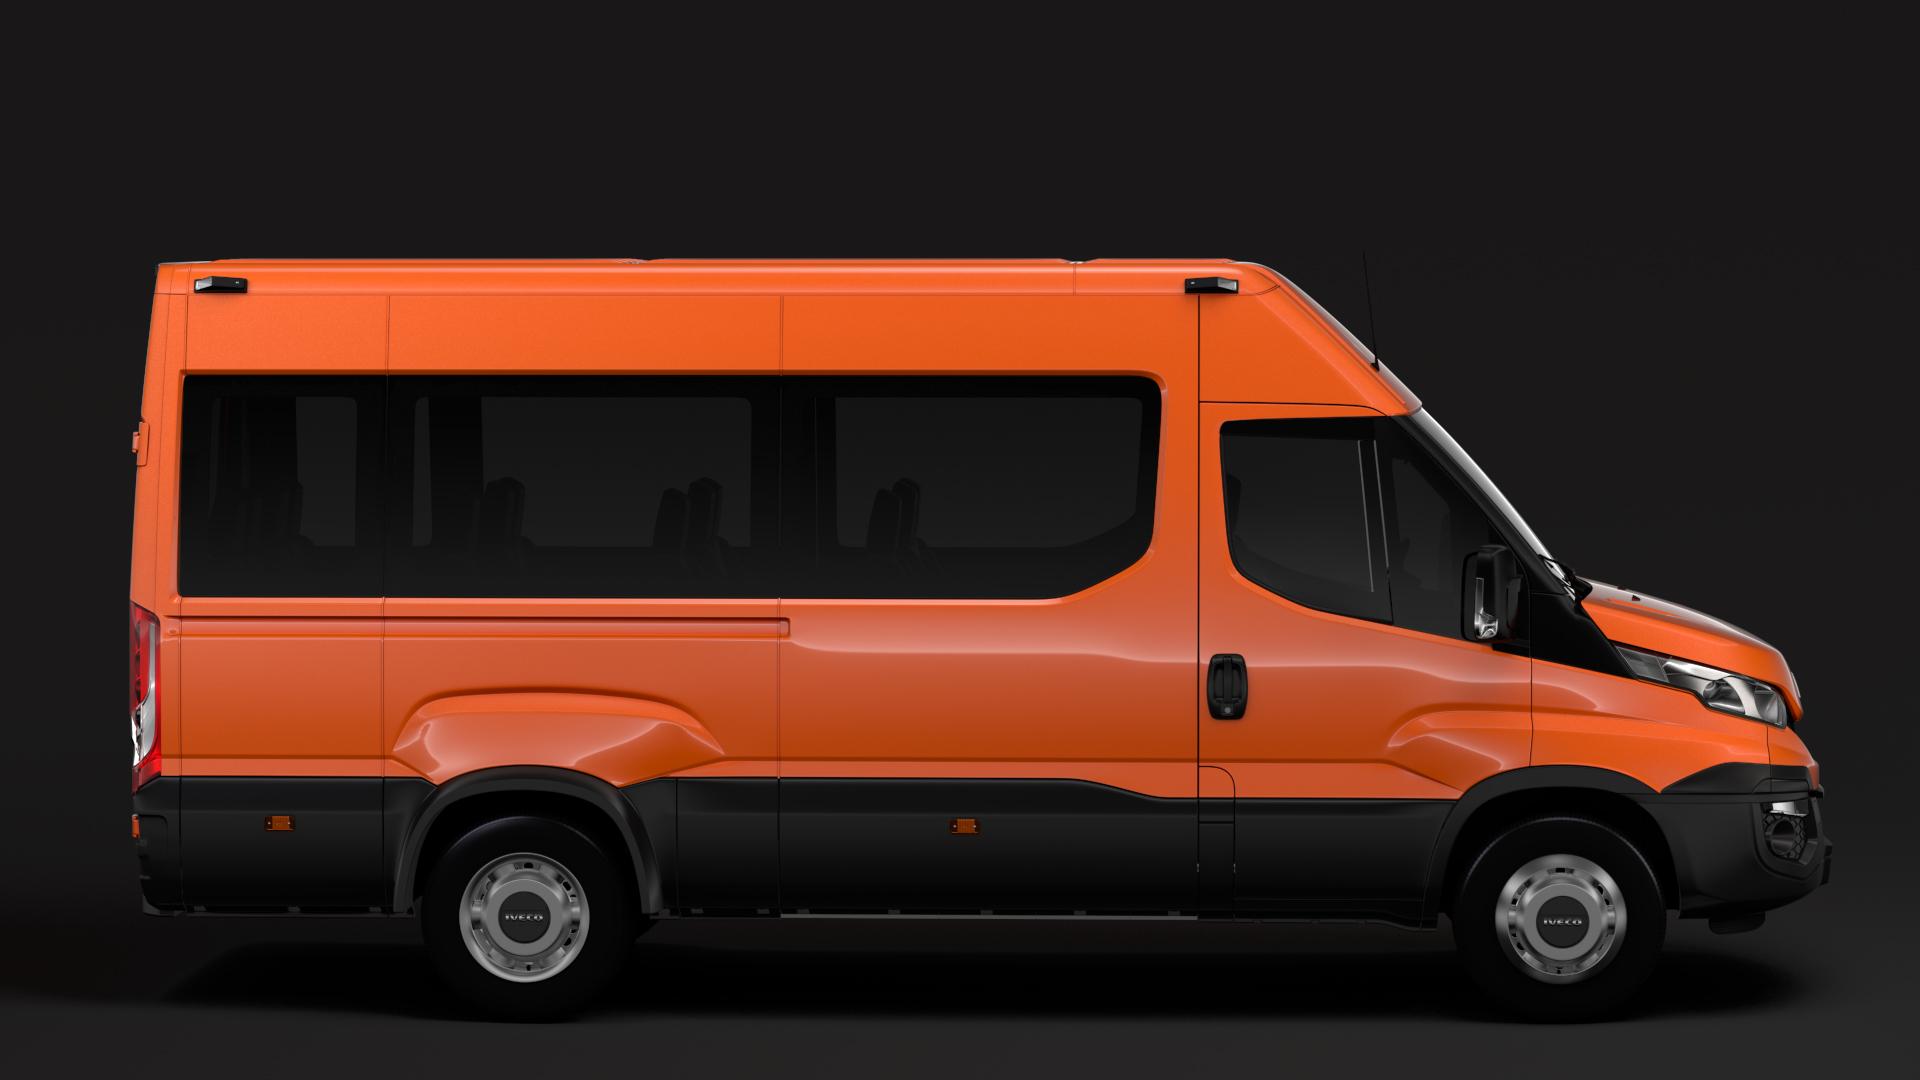 iveco daily minibus l3h2 2014-2016 3d model max fbx c4d lwo ma mb hrc xsi obj 276049